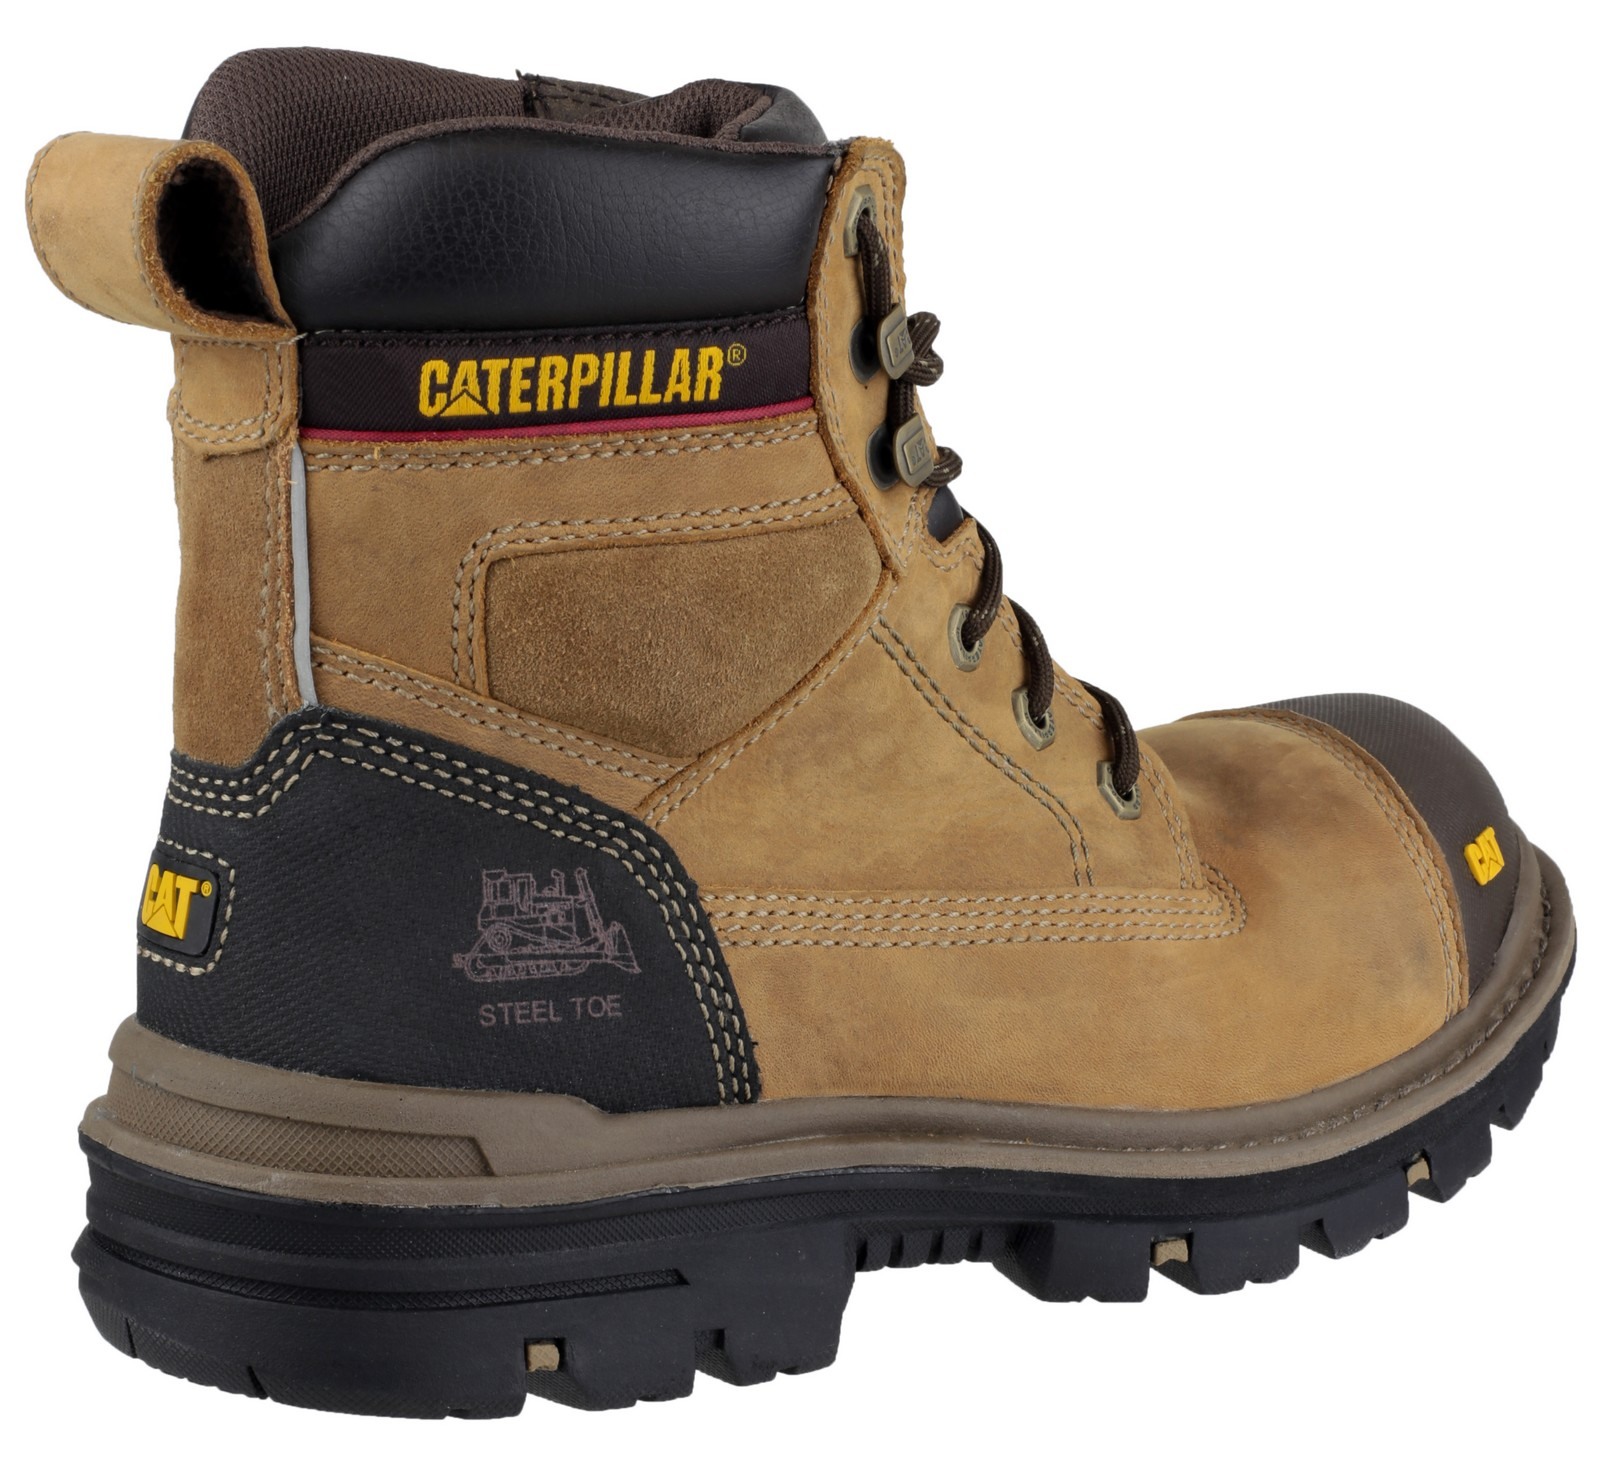 "Caterpillar CAT Gravel 6"" Safety Work Boots | eBay"